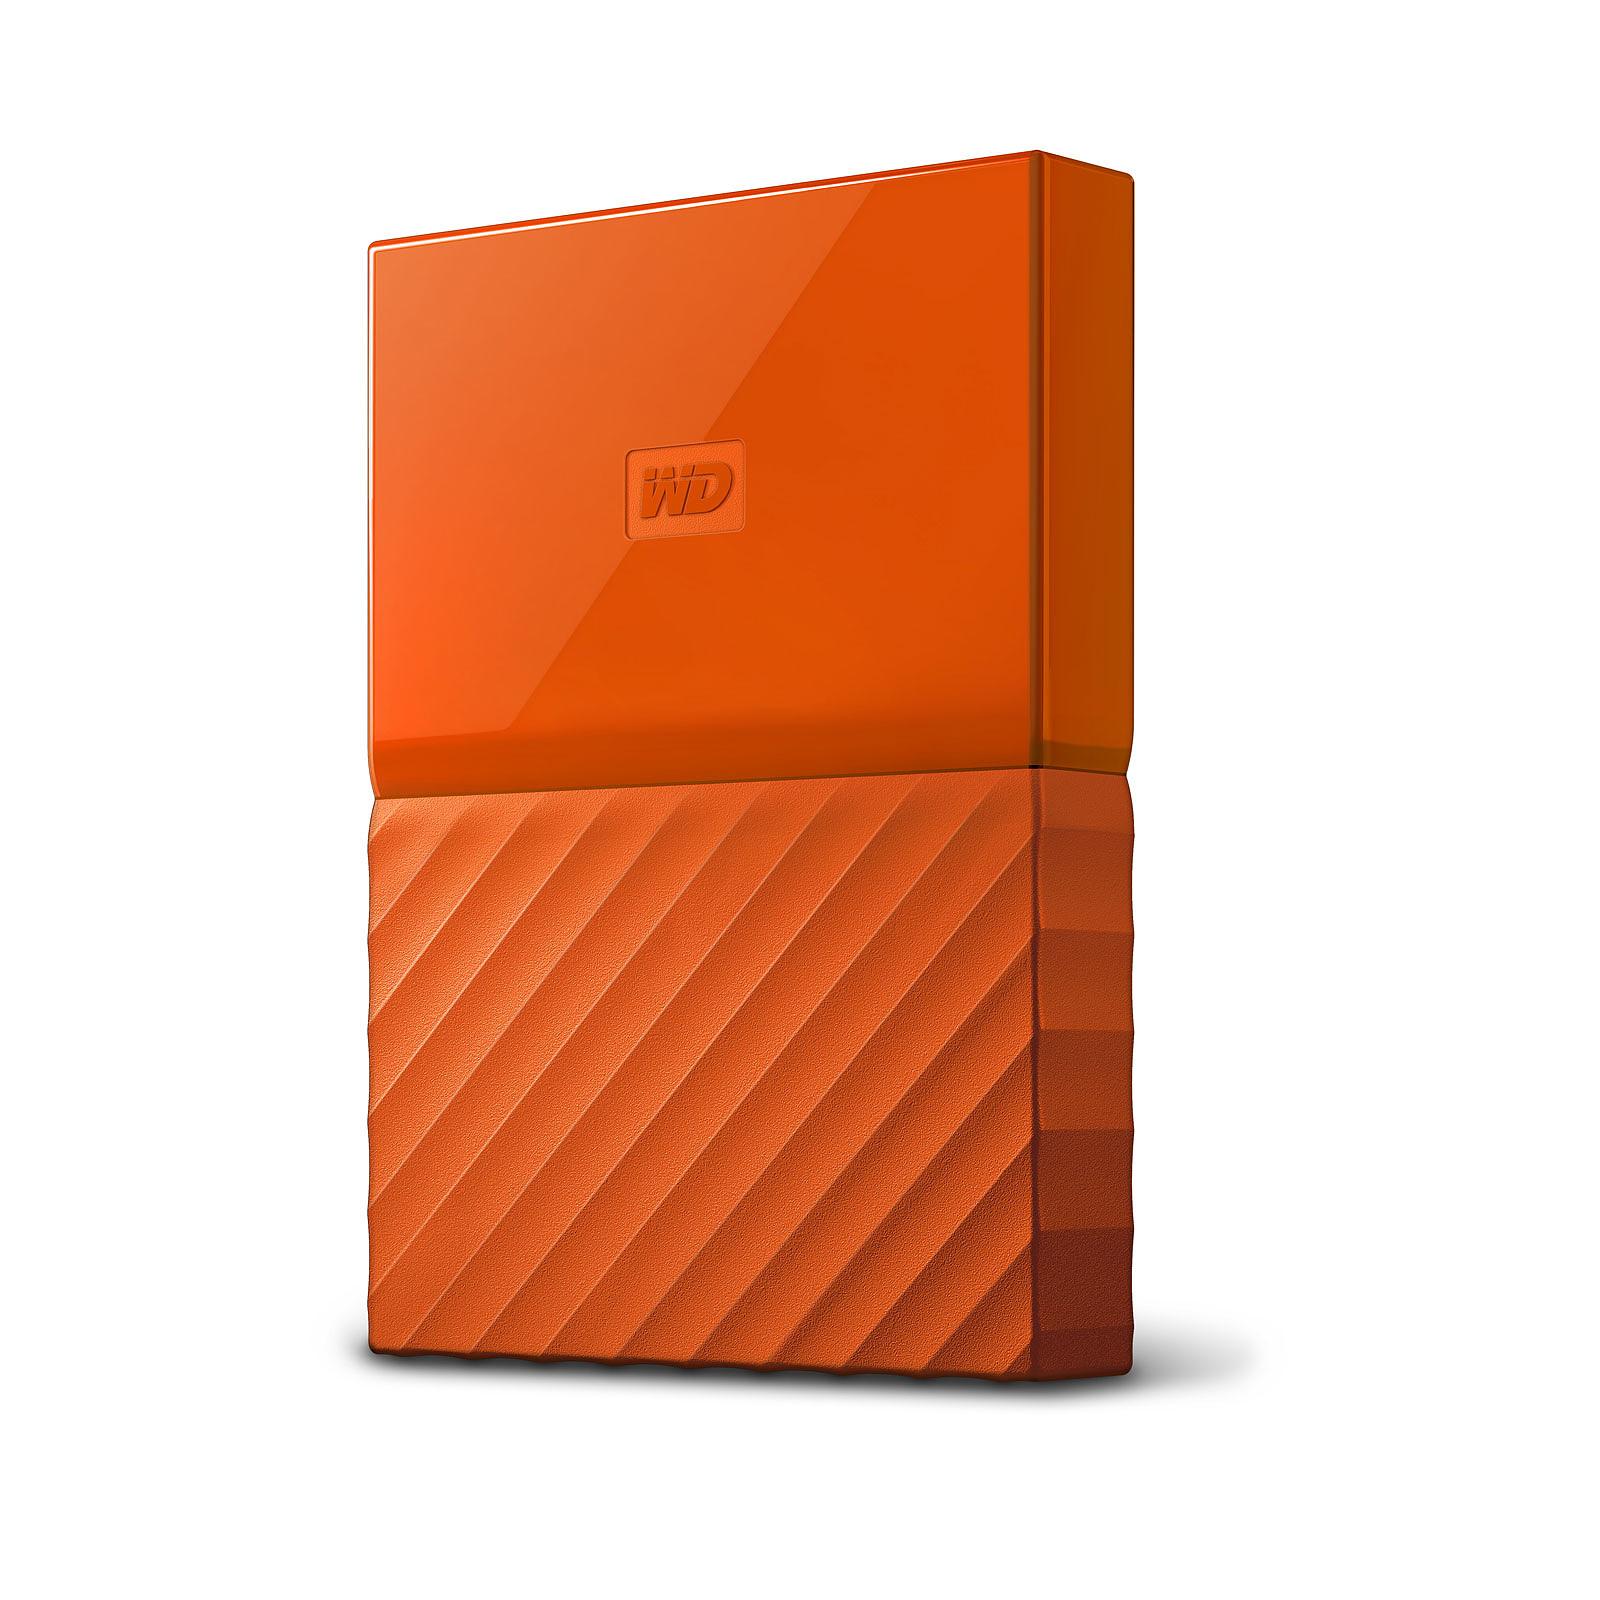 WD My Passport 2 To Orange (USB 3.0)